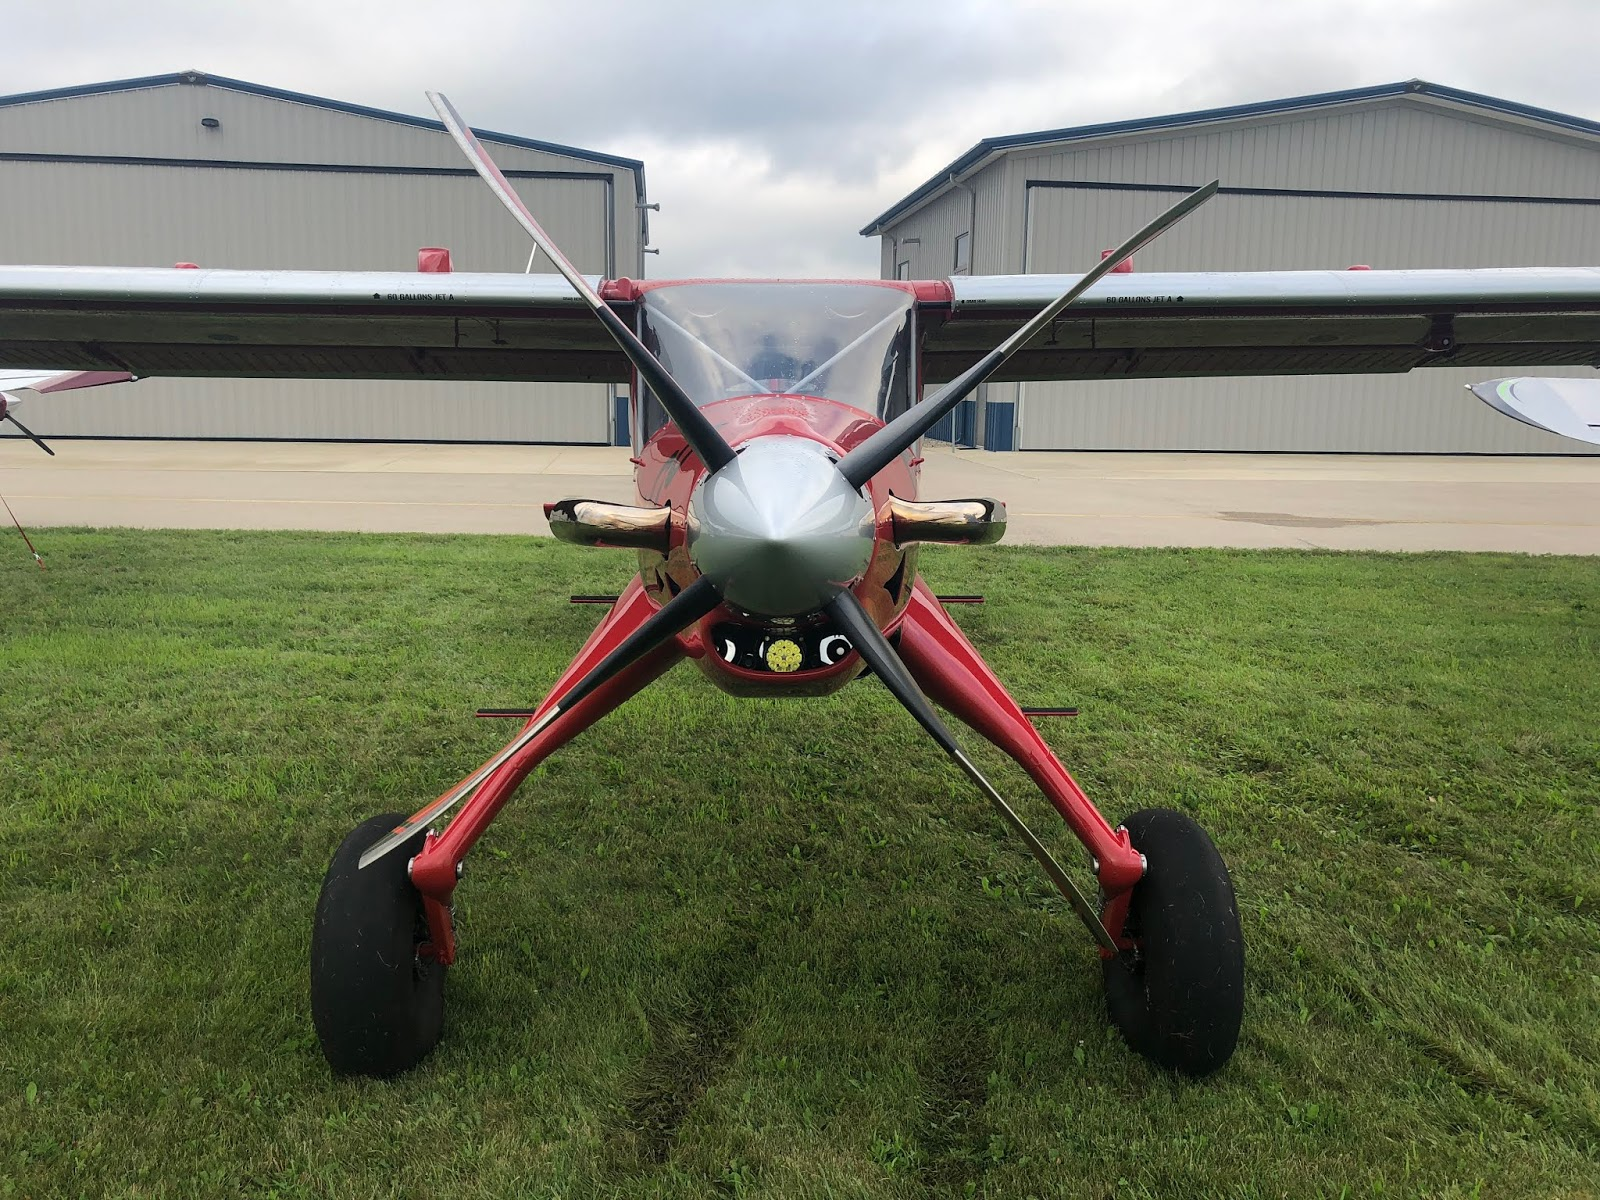 Cessnateur: Draco - Mike Patey's Incredible PZL-104 Turbine